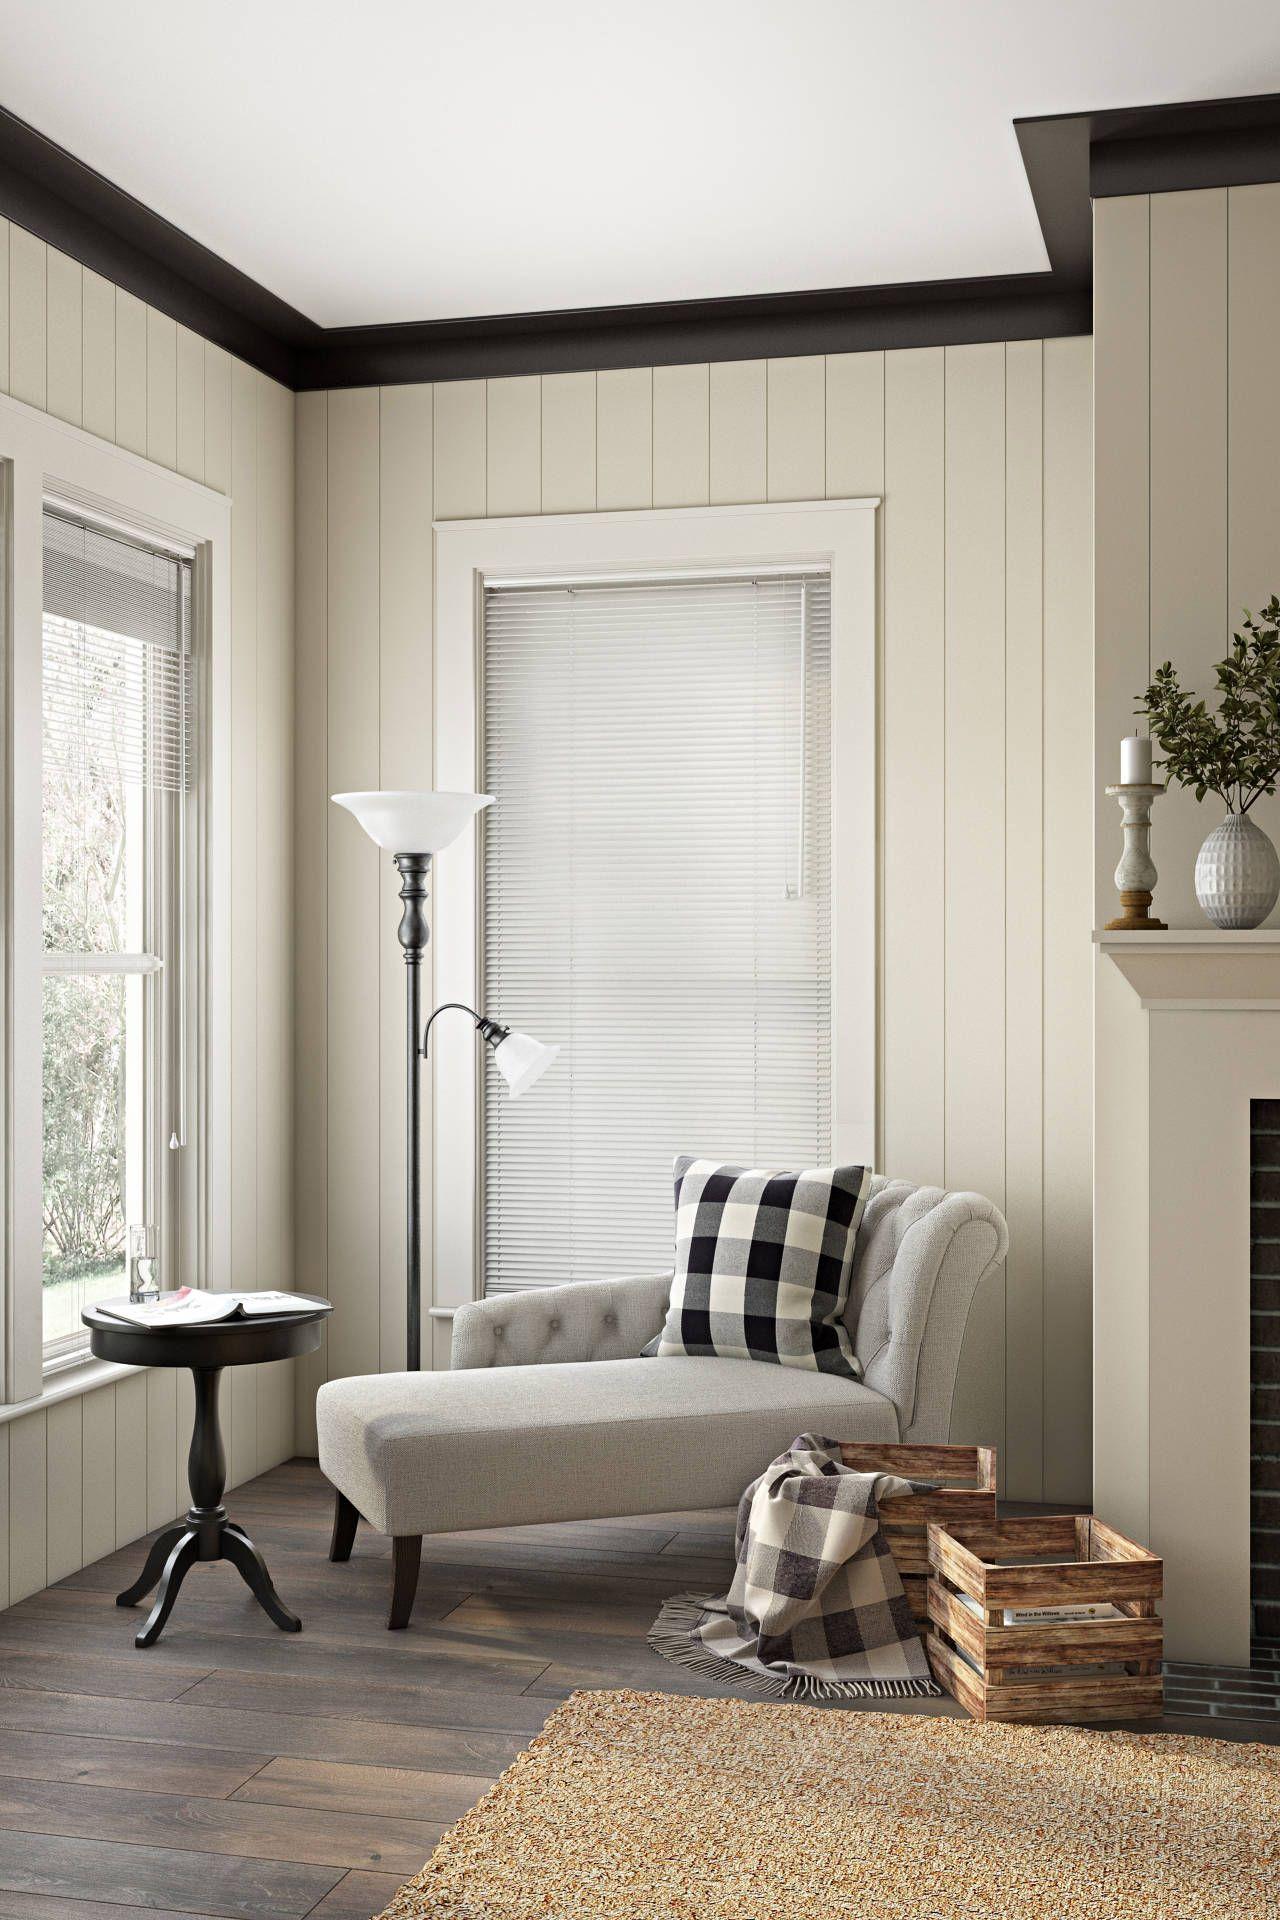 #sofa #livingroom #velvetsofa #decoratingideas #livingroomideas #FloridaInteriors #TownhomeLiving #bluedecor #decoratingideas #livingroomdecor #whitekitchen #openconcept #blackandwhitedecor